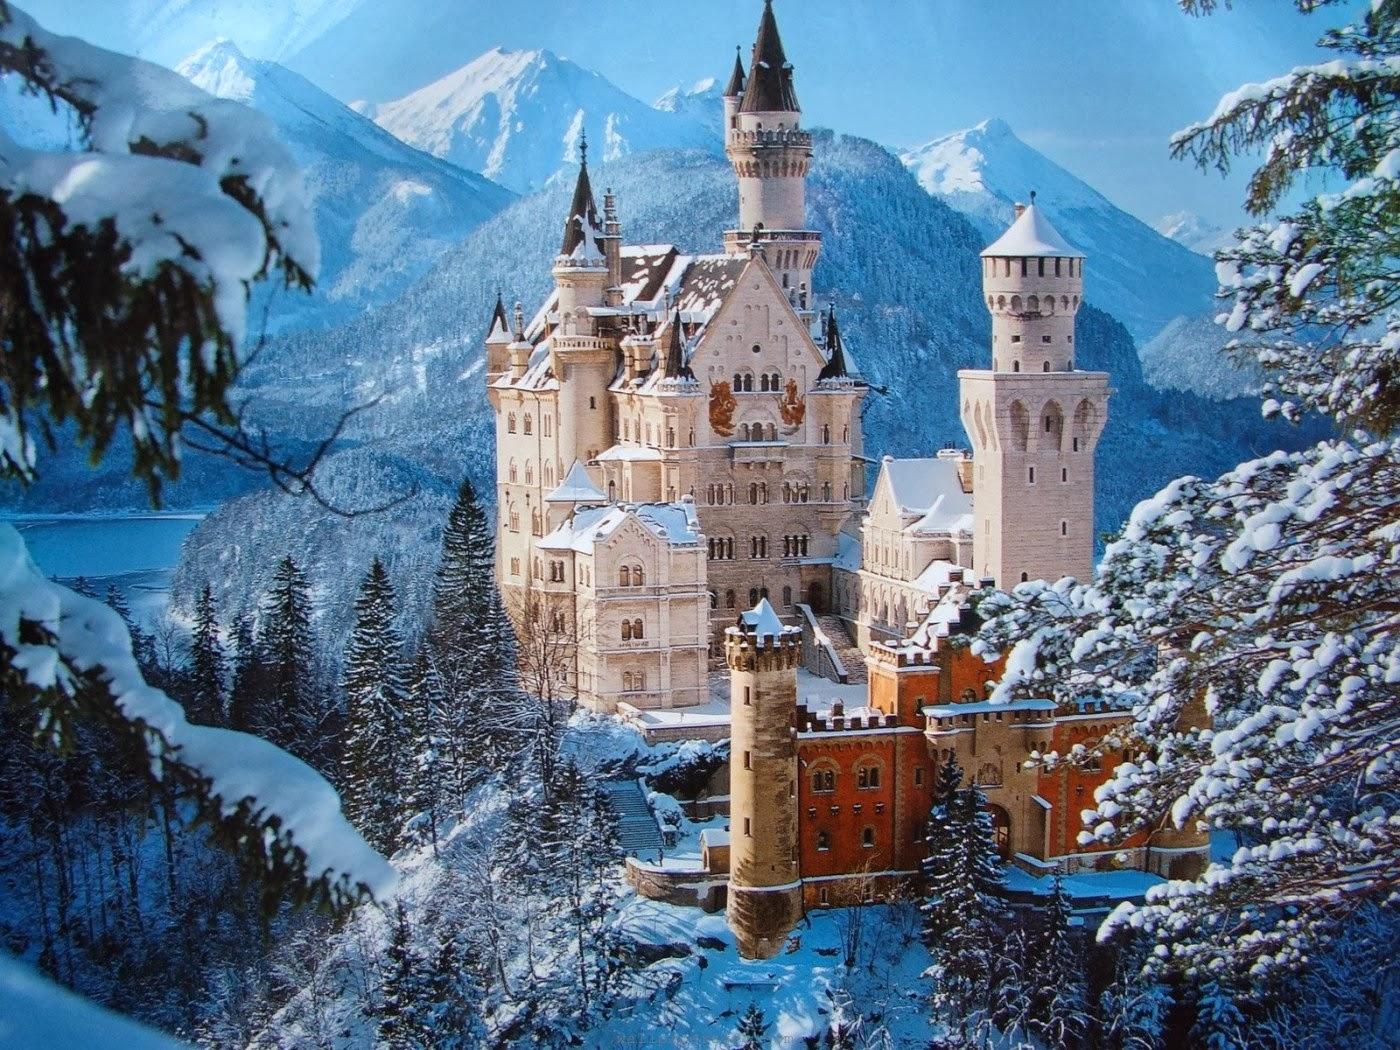 El príncipe mendigo Castello-Neuschwanstein